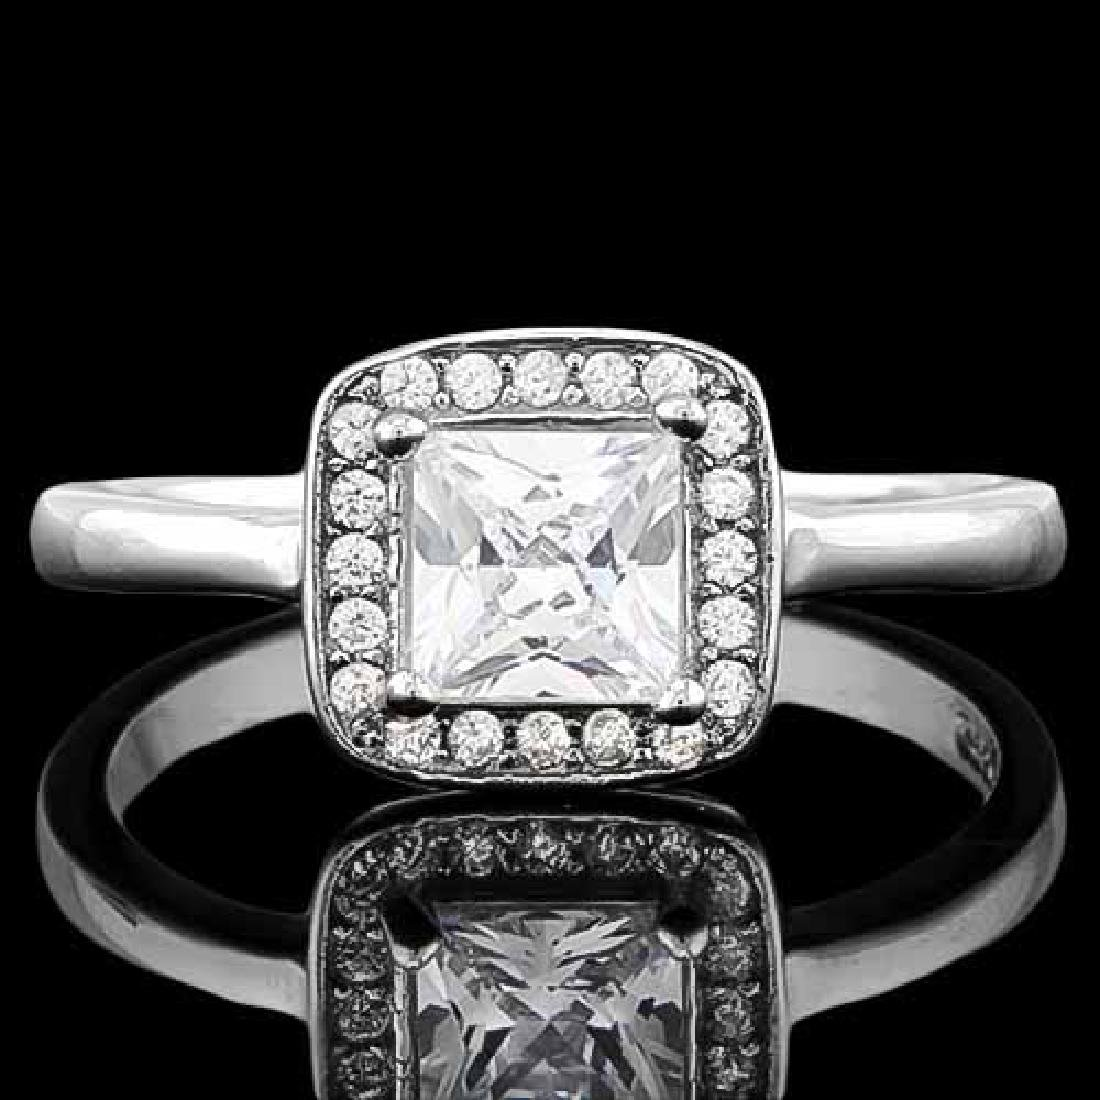 1 2/3 CARAT (21 PCS) FLAWLESS CREATED DIAMOND 925 STERL